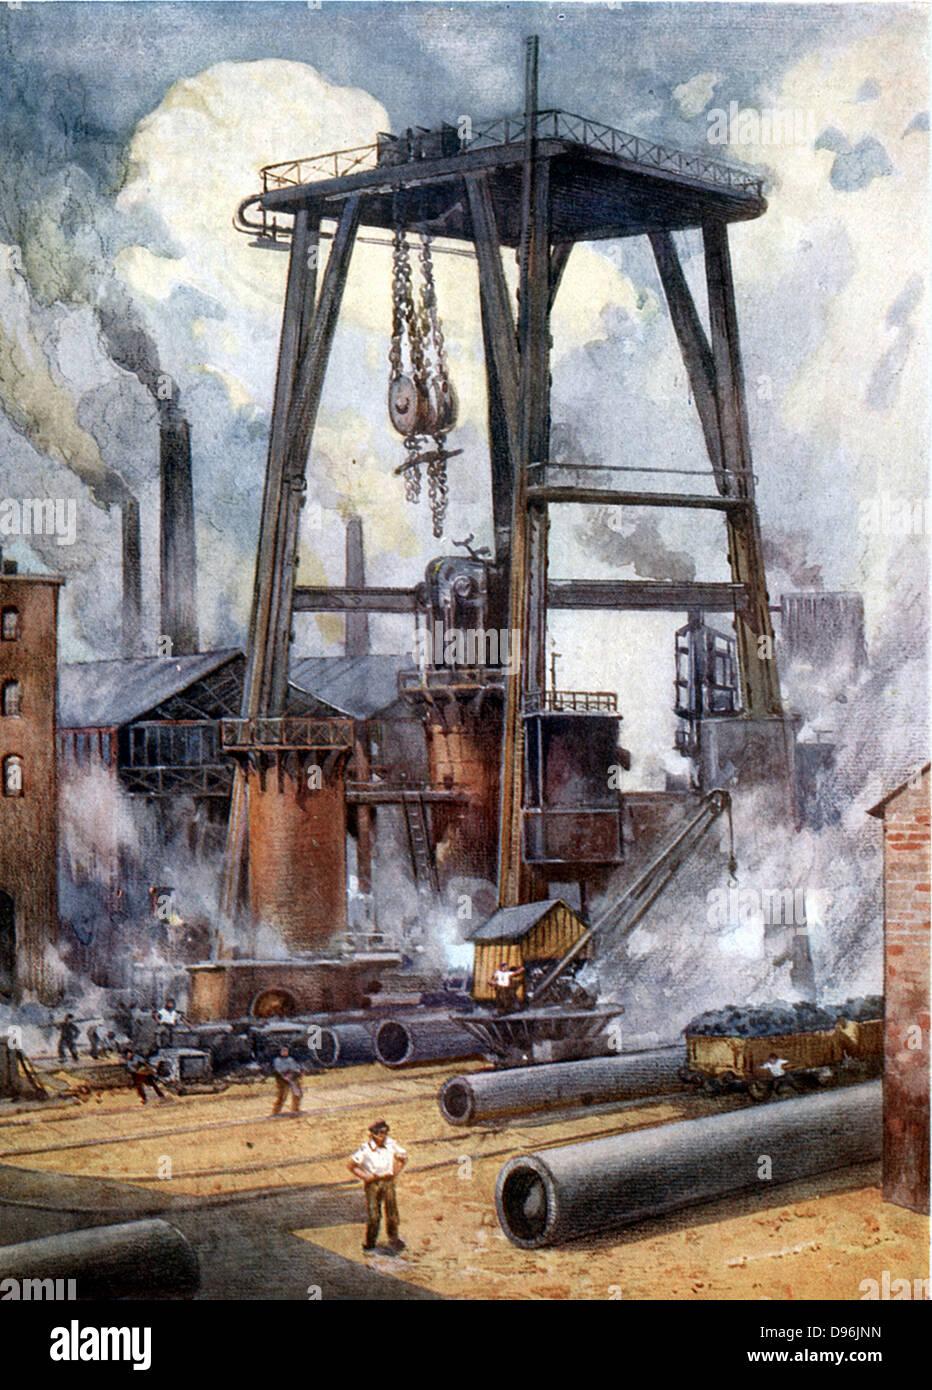 Steel works c1925. Illustration. - Stock Image